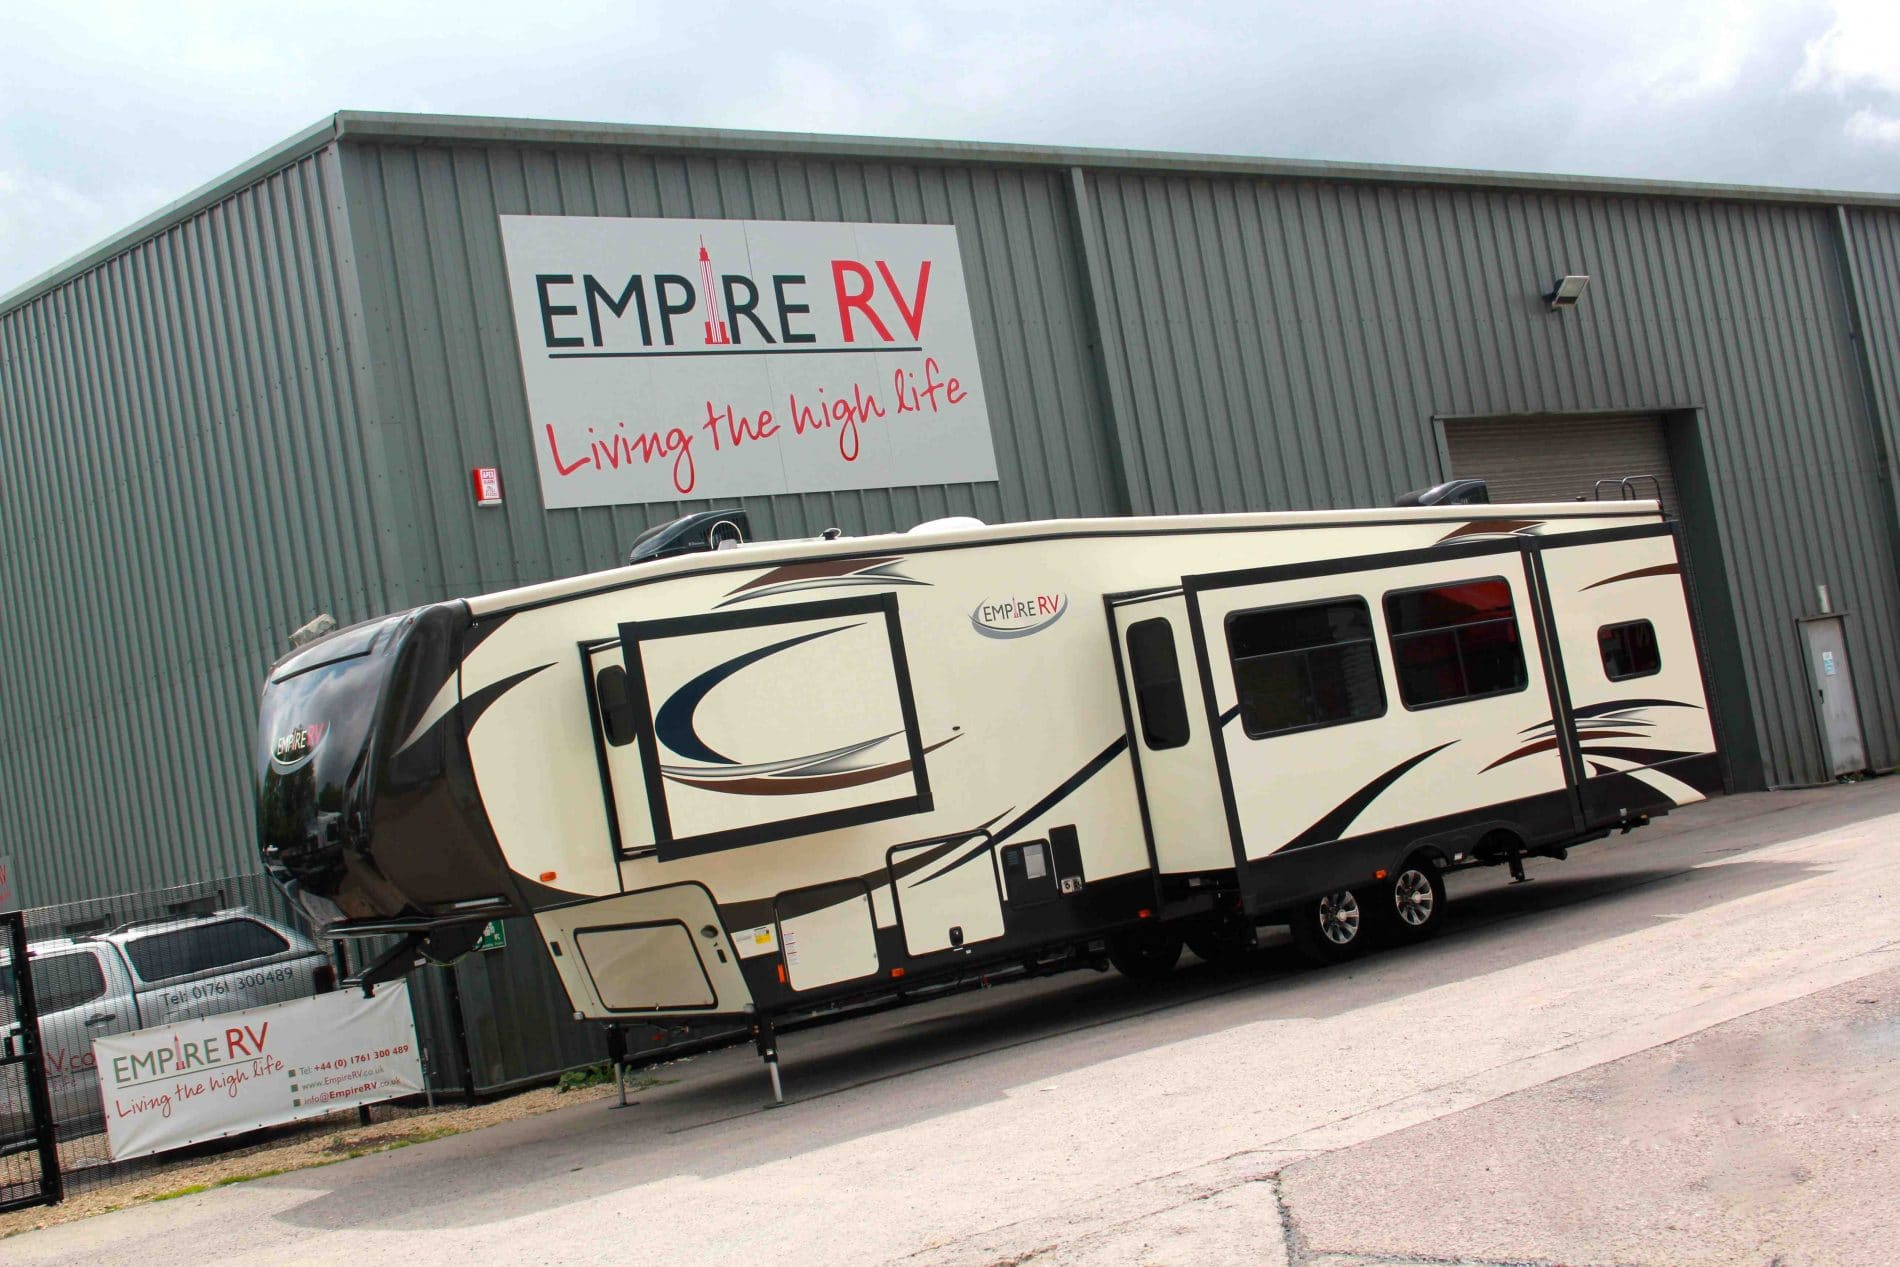 Empire RV Resort RV Motorhomes for sale rent – (c) Empire RV